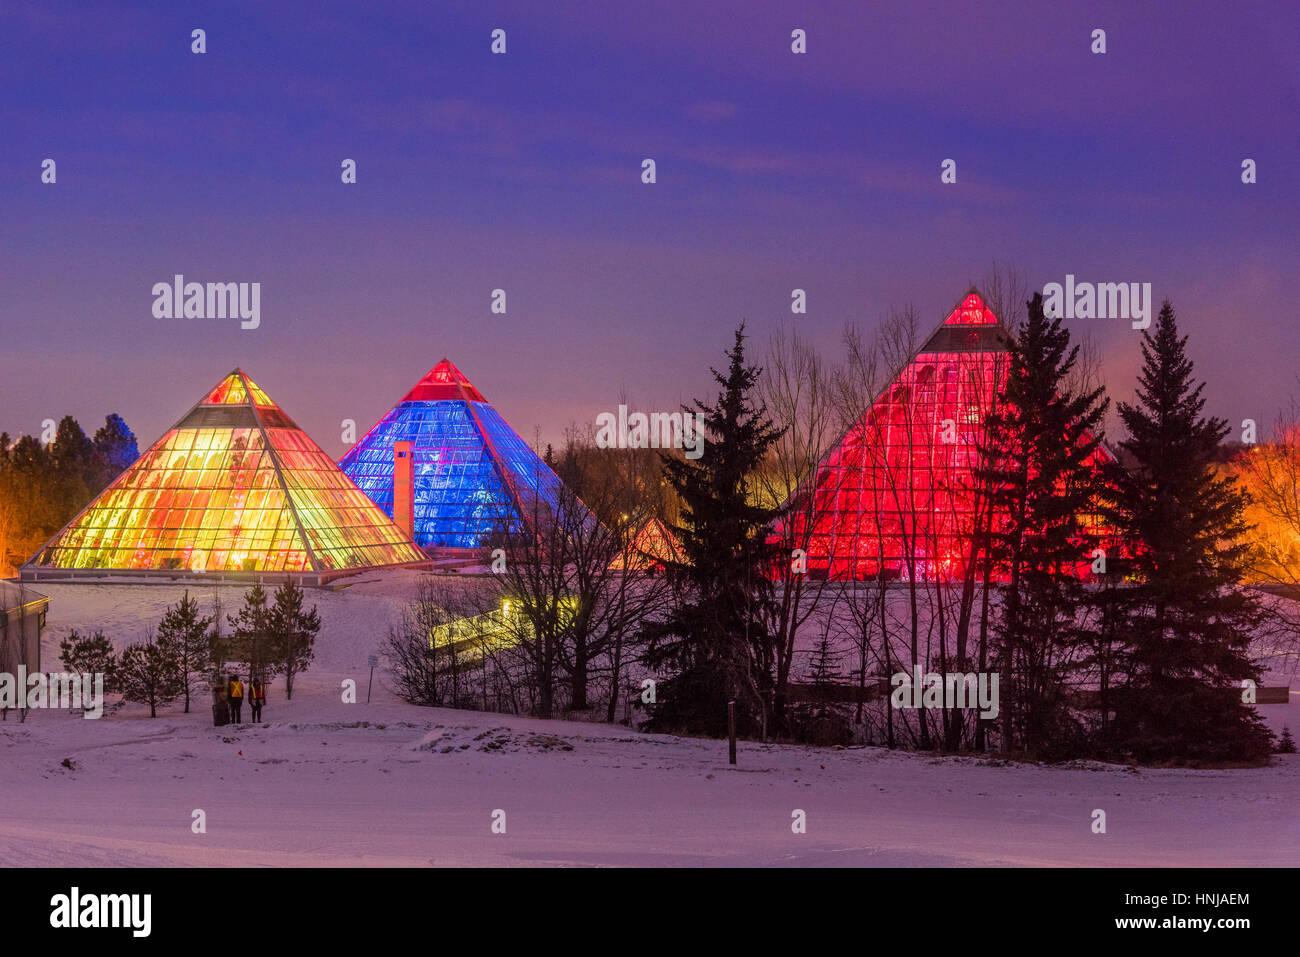 Illuminated Muttart Conservatory pyramids, a Botanical Garden in Edmonton, Alberta, Canada - Stock Image